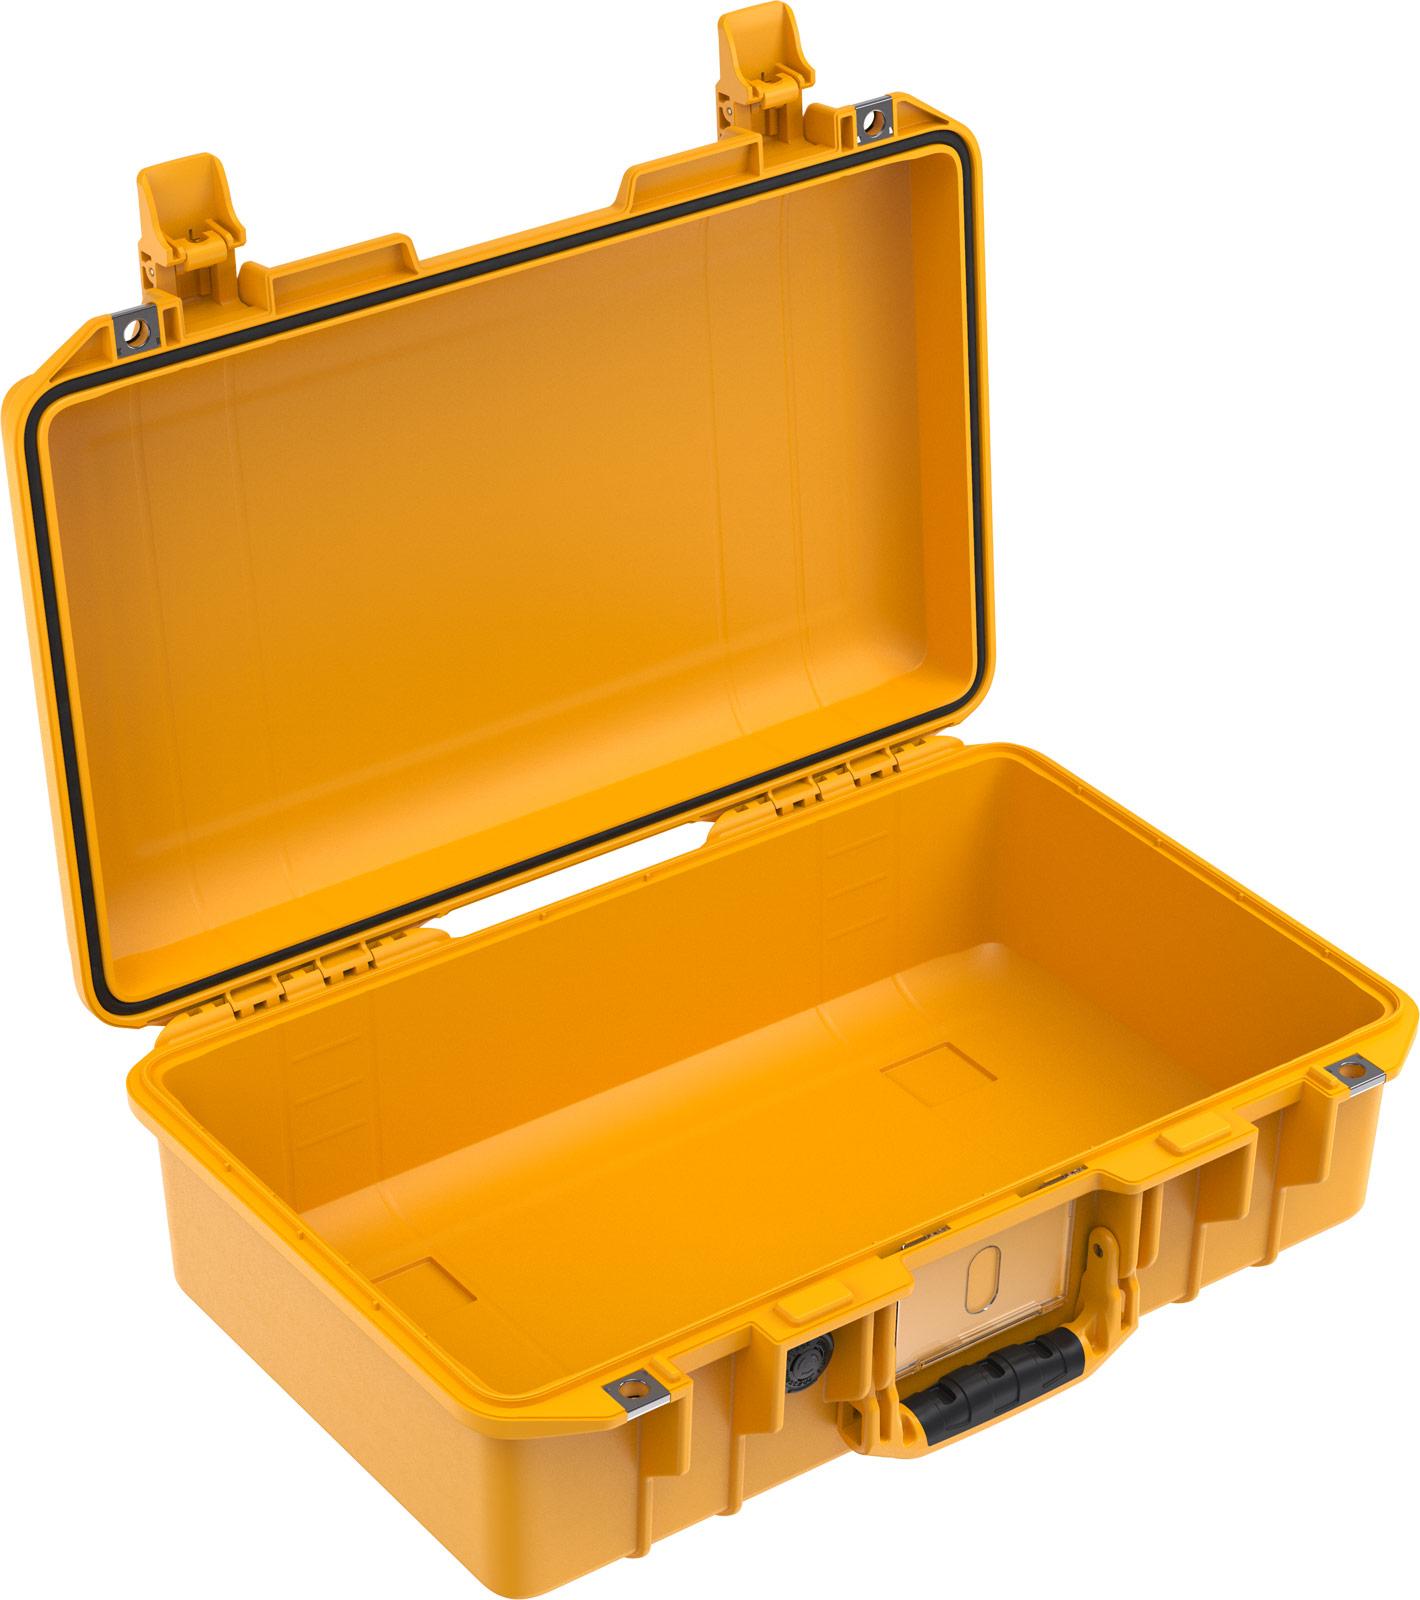 pelican air 1485 yellow camera case